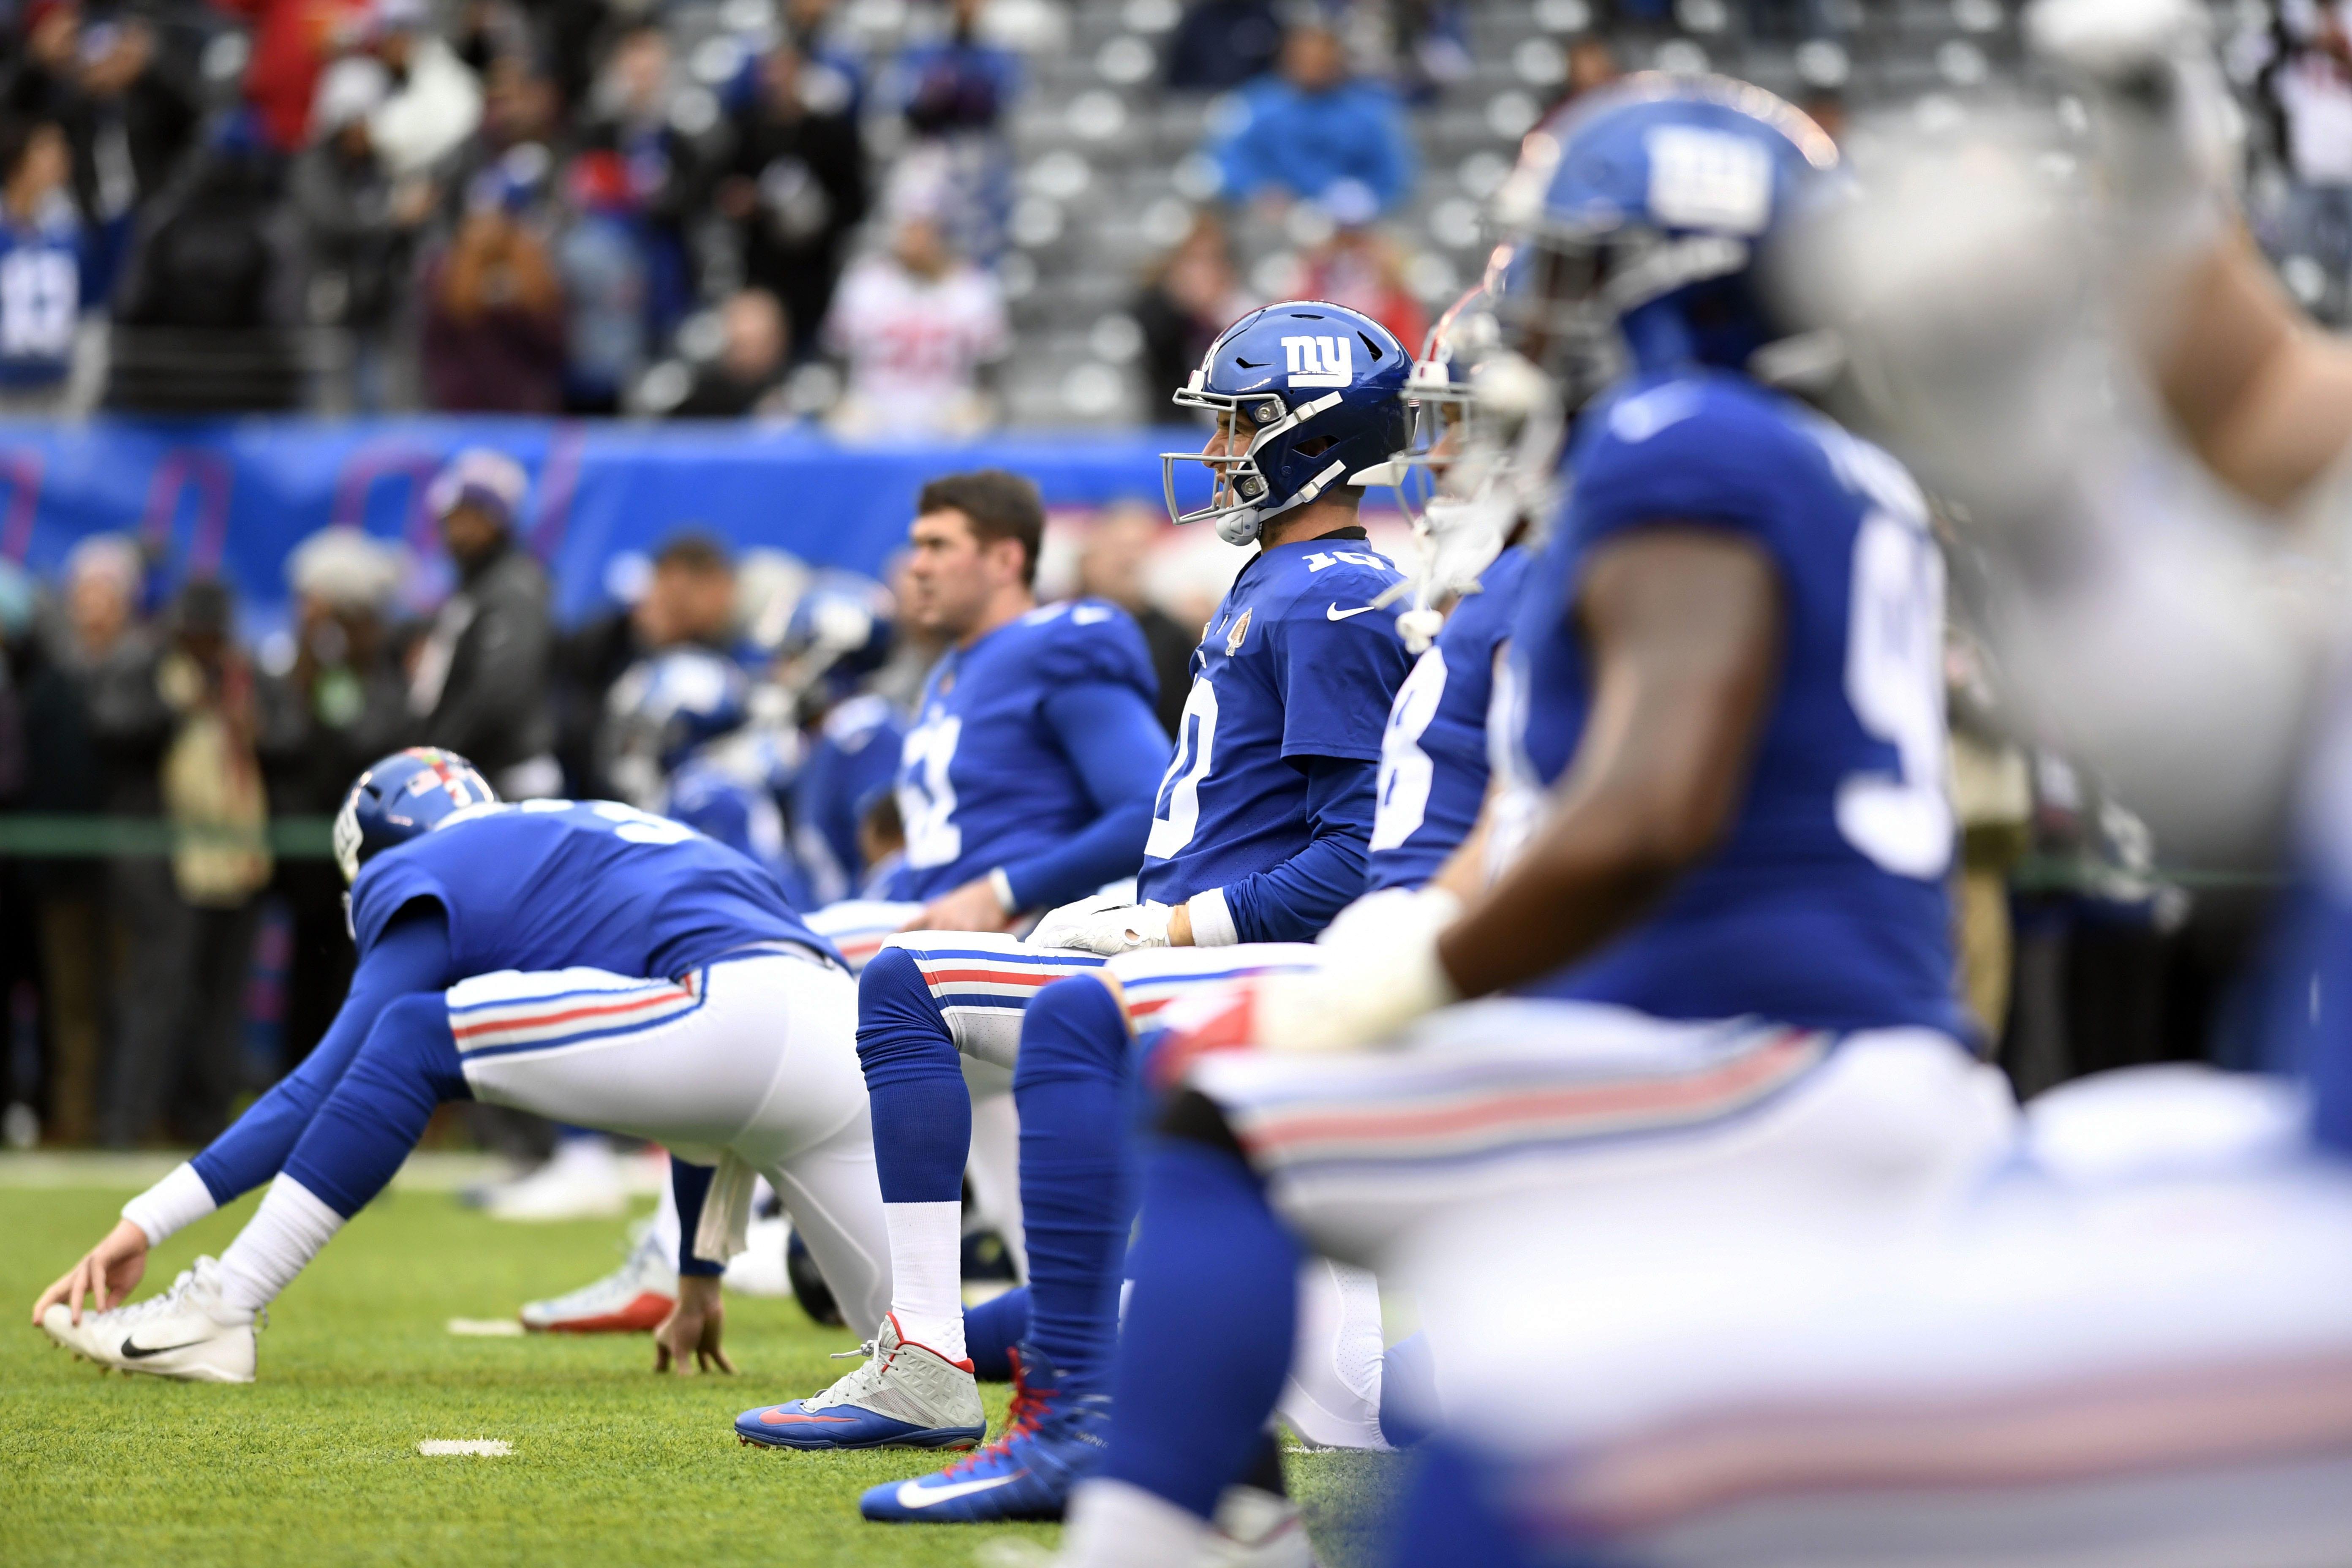 New York Giants: 18 Game Season Proposal Could Hurt Thin